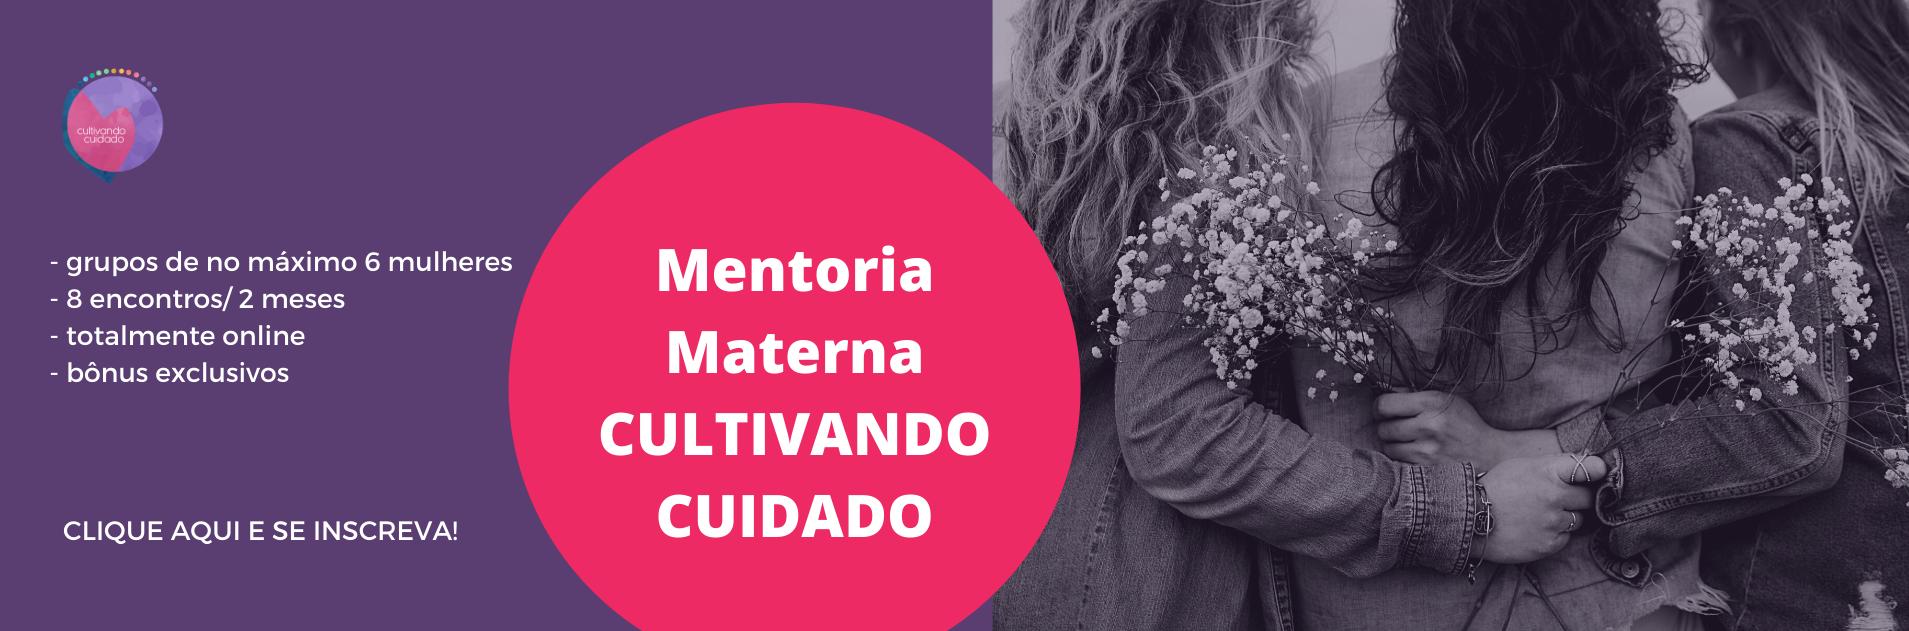 mentoria materna